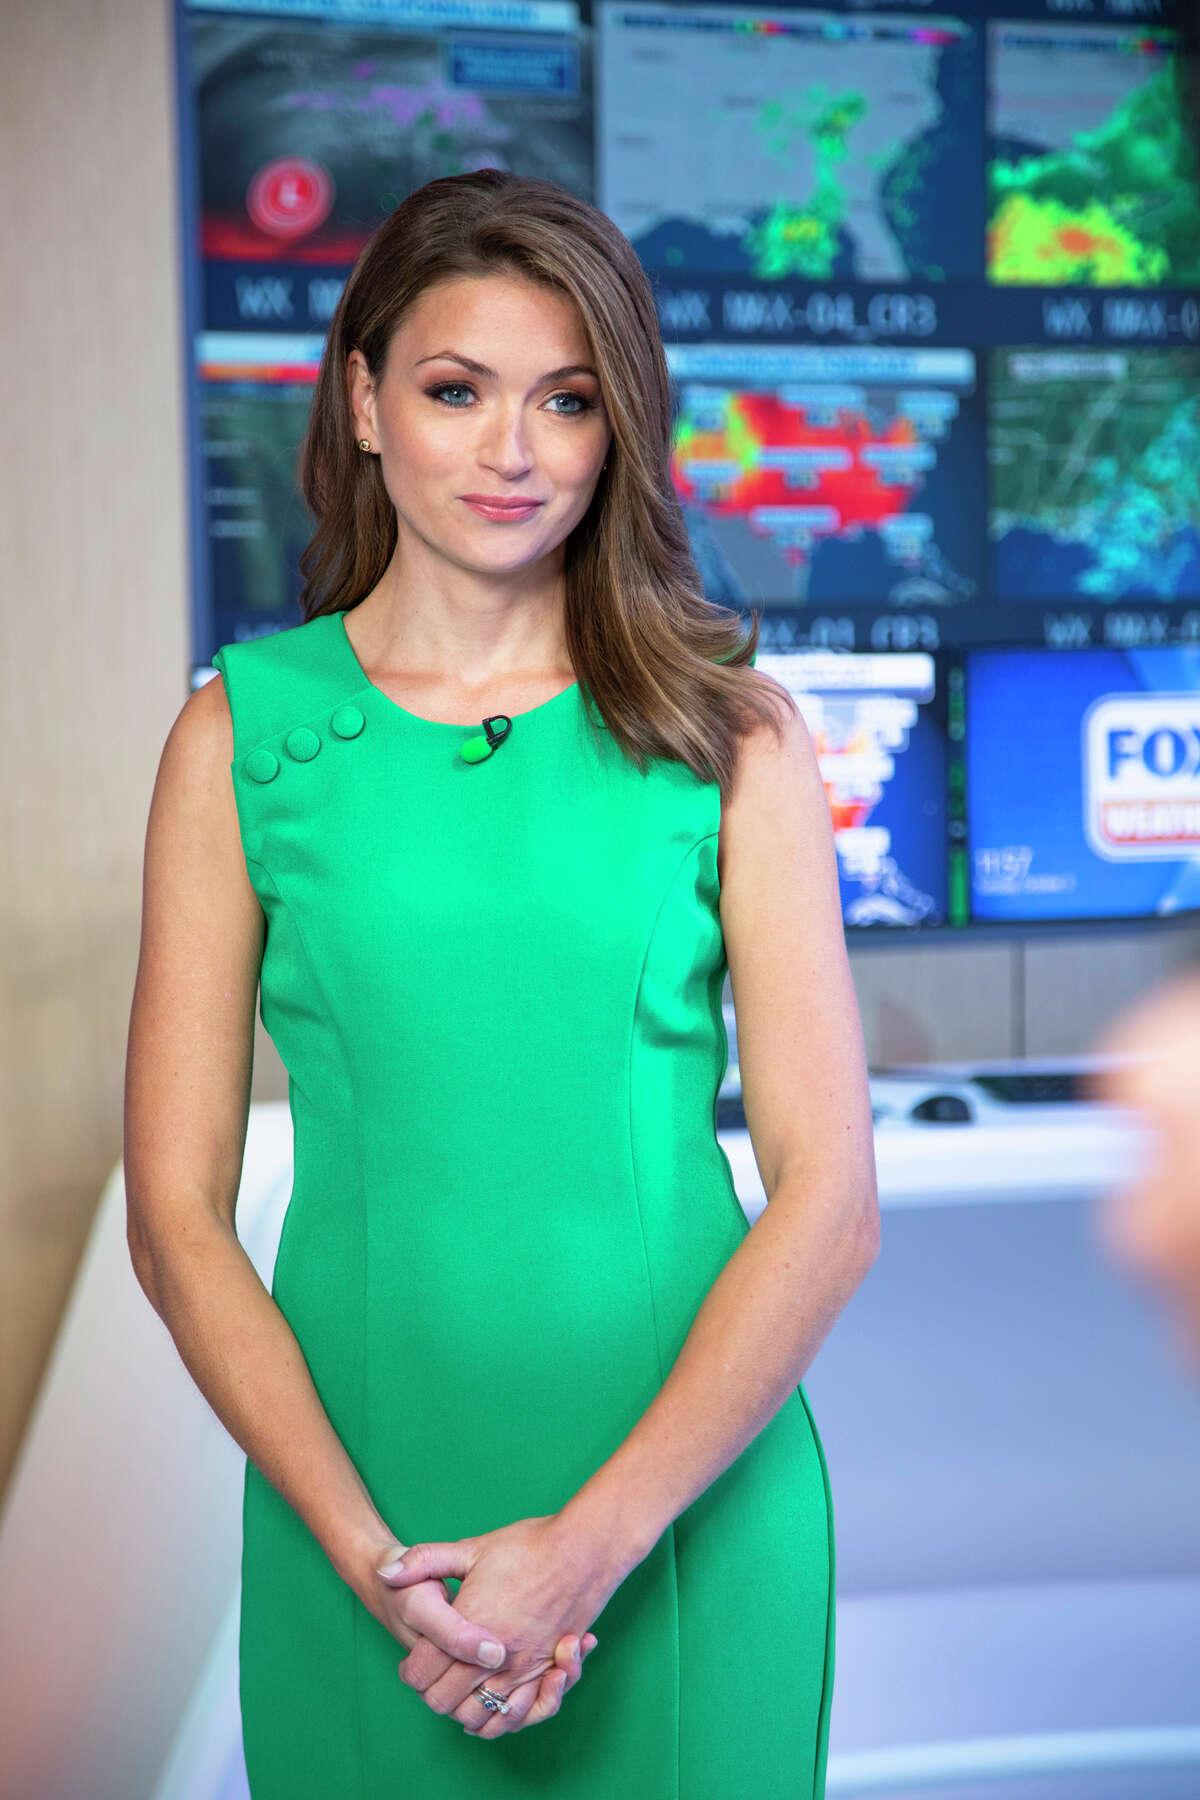 Britta Merwin joins FOX Weather starting October 25.